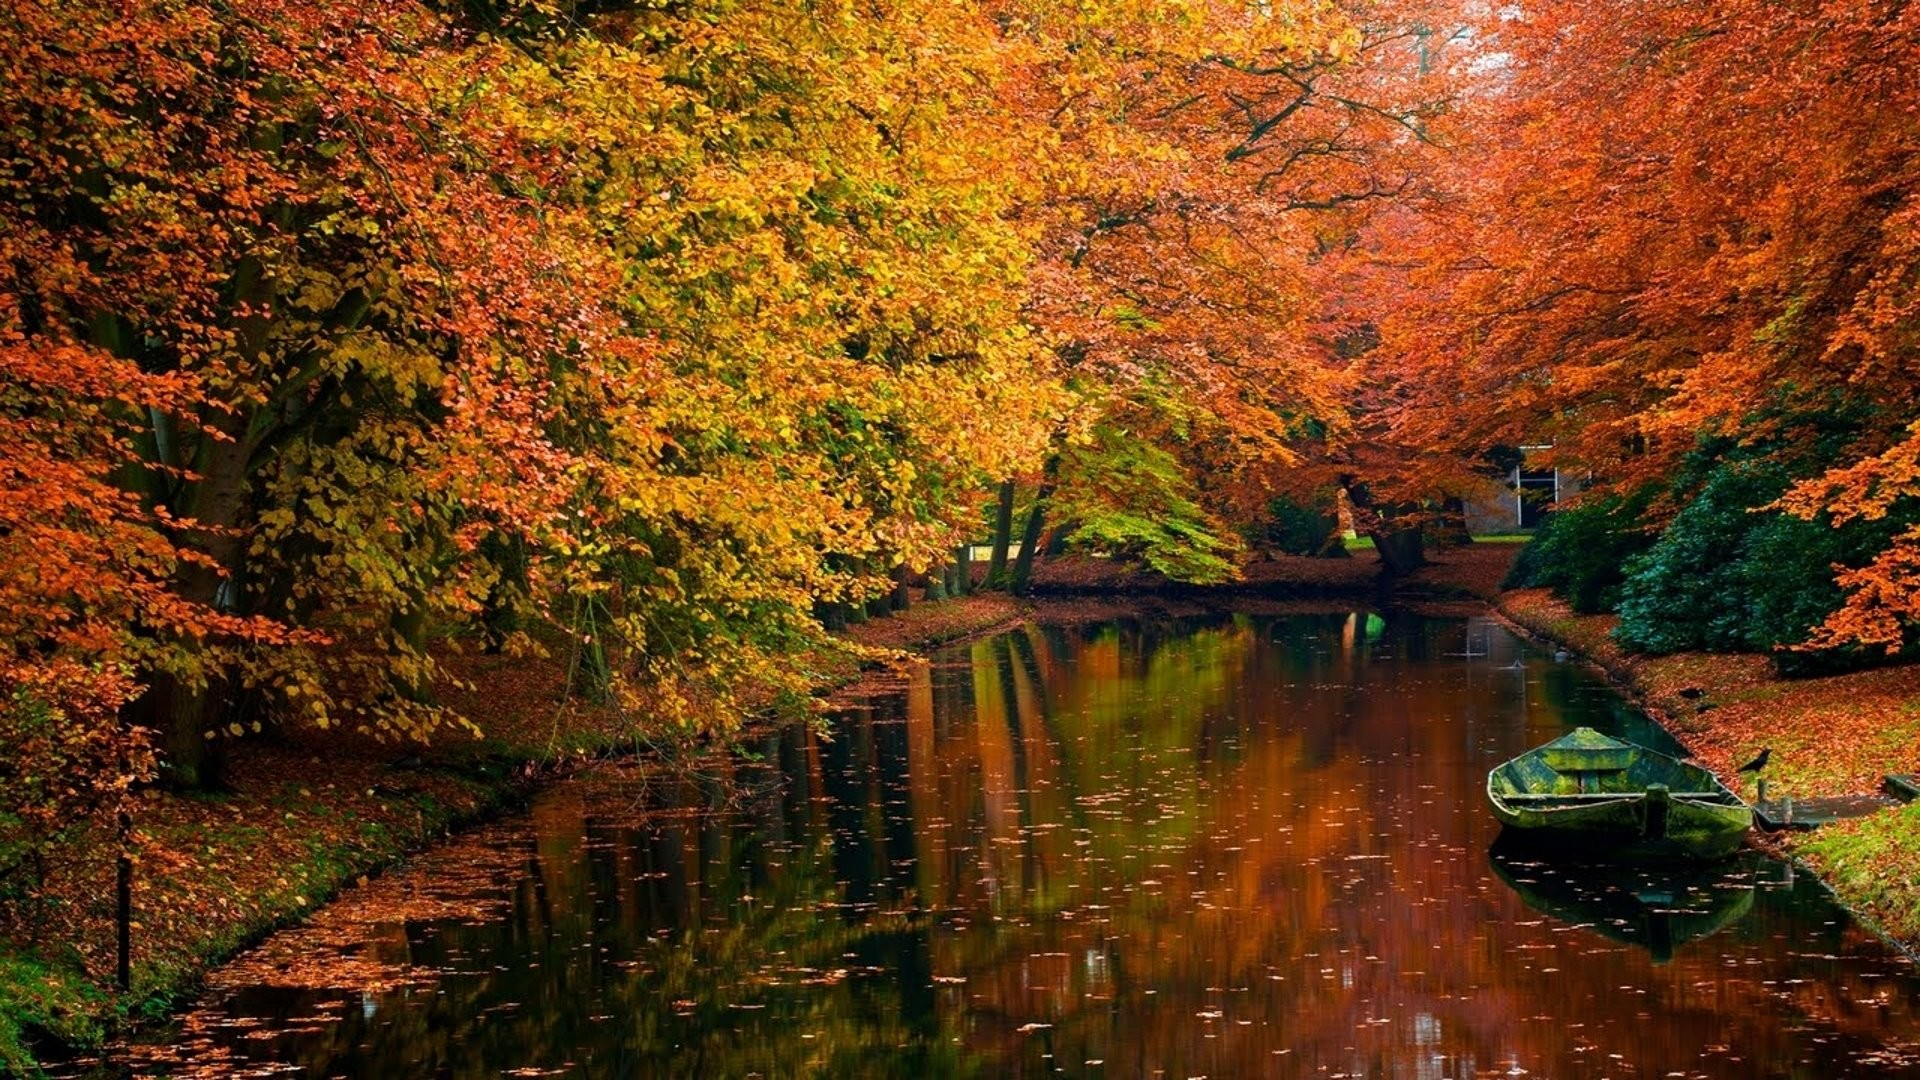 River And Fall Wallpaper Desktop HQ Wallpape 3741   HD 1920x1080